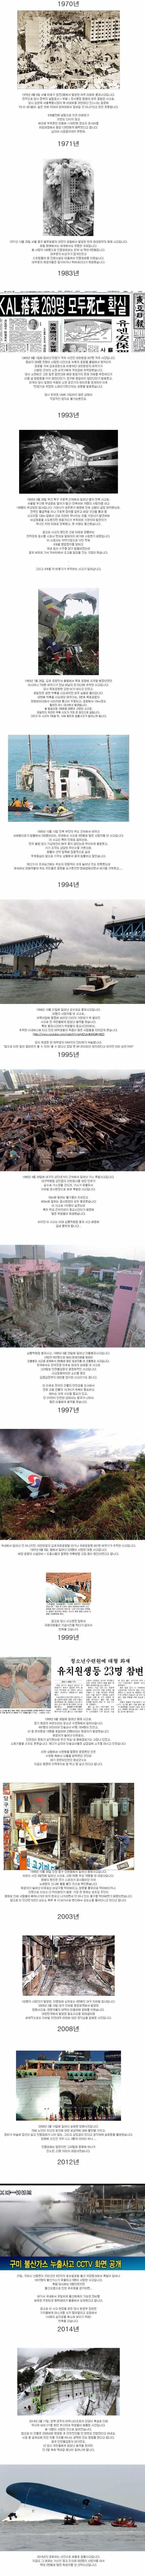 Awx5aefbe036158b.jpg 역사로 보는 대한민국 최악의 참사들